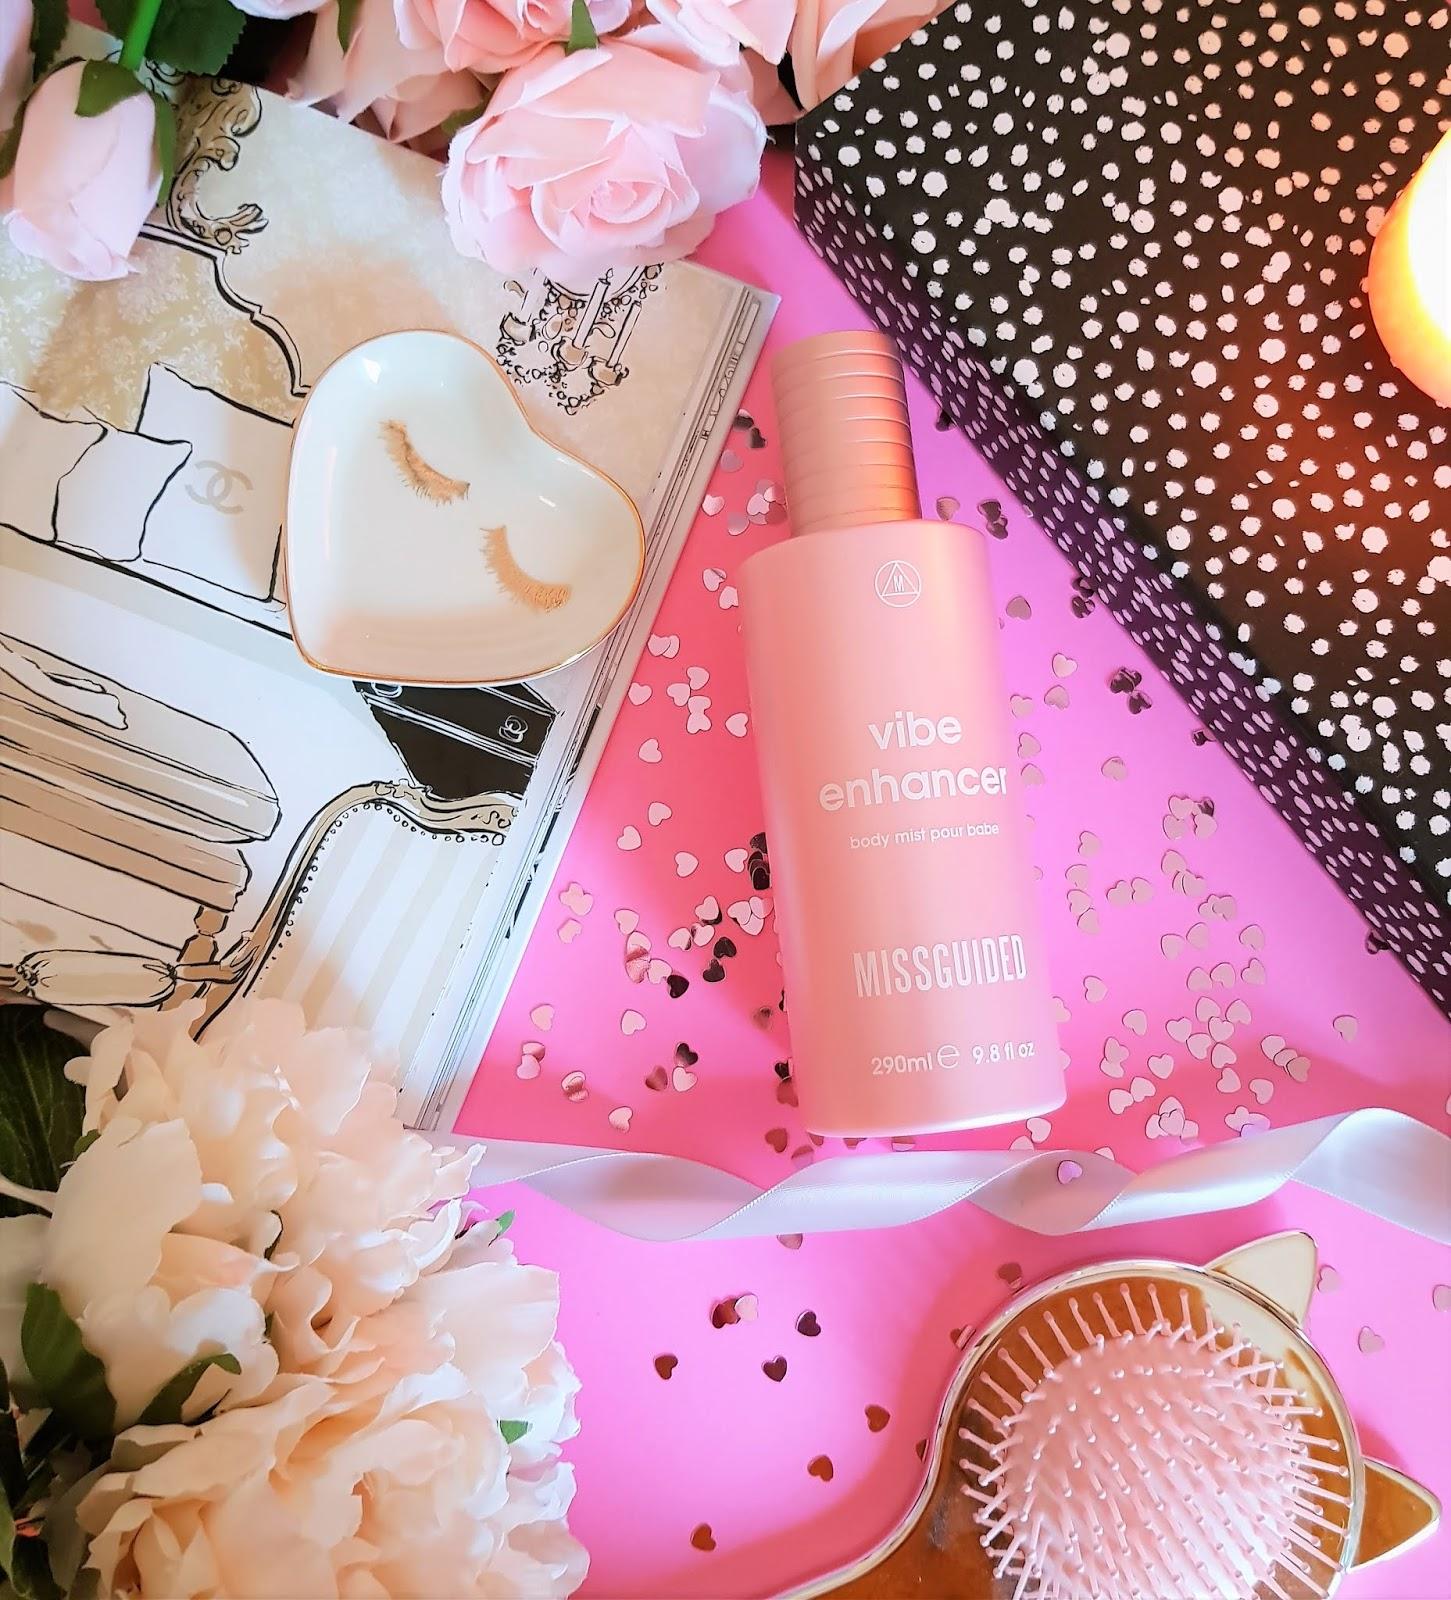 Vibe Enhancer Body Spray By Missguided